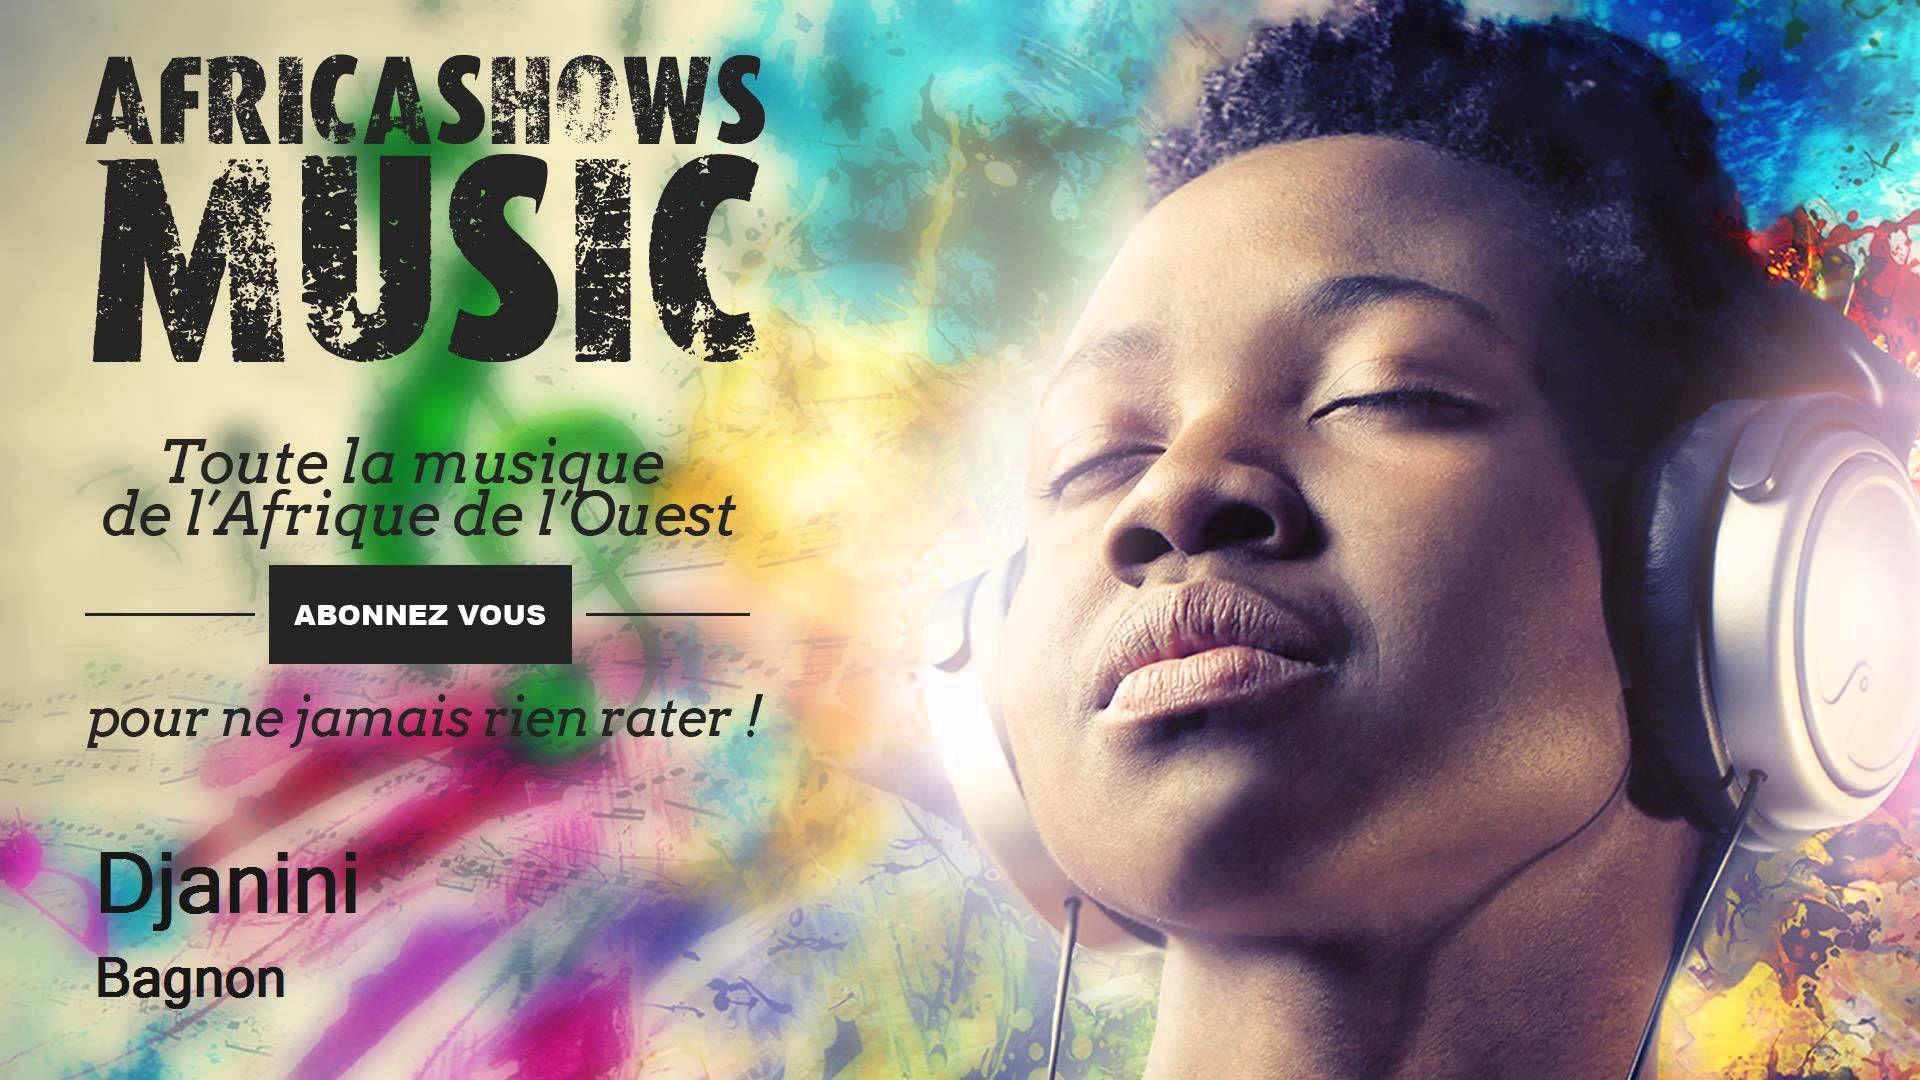 Djanini Bagnon African Dance Music Sing Types Of Music